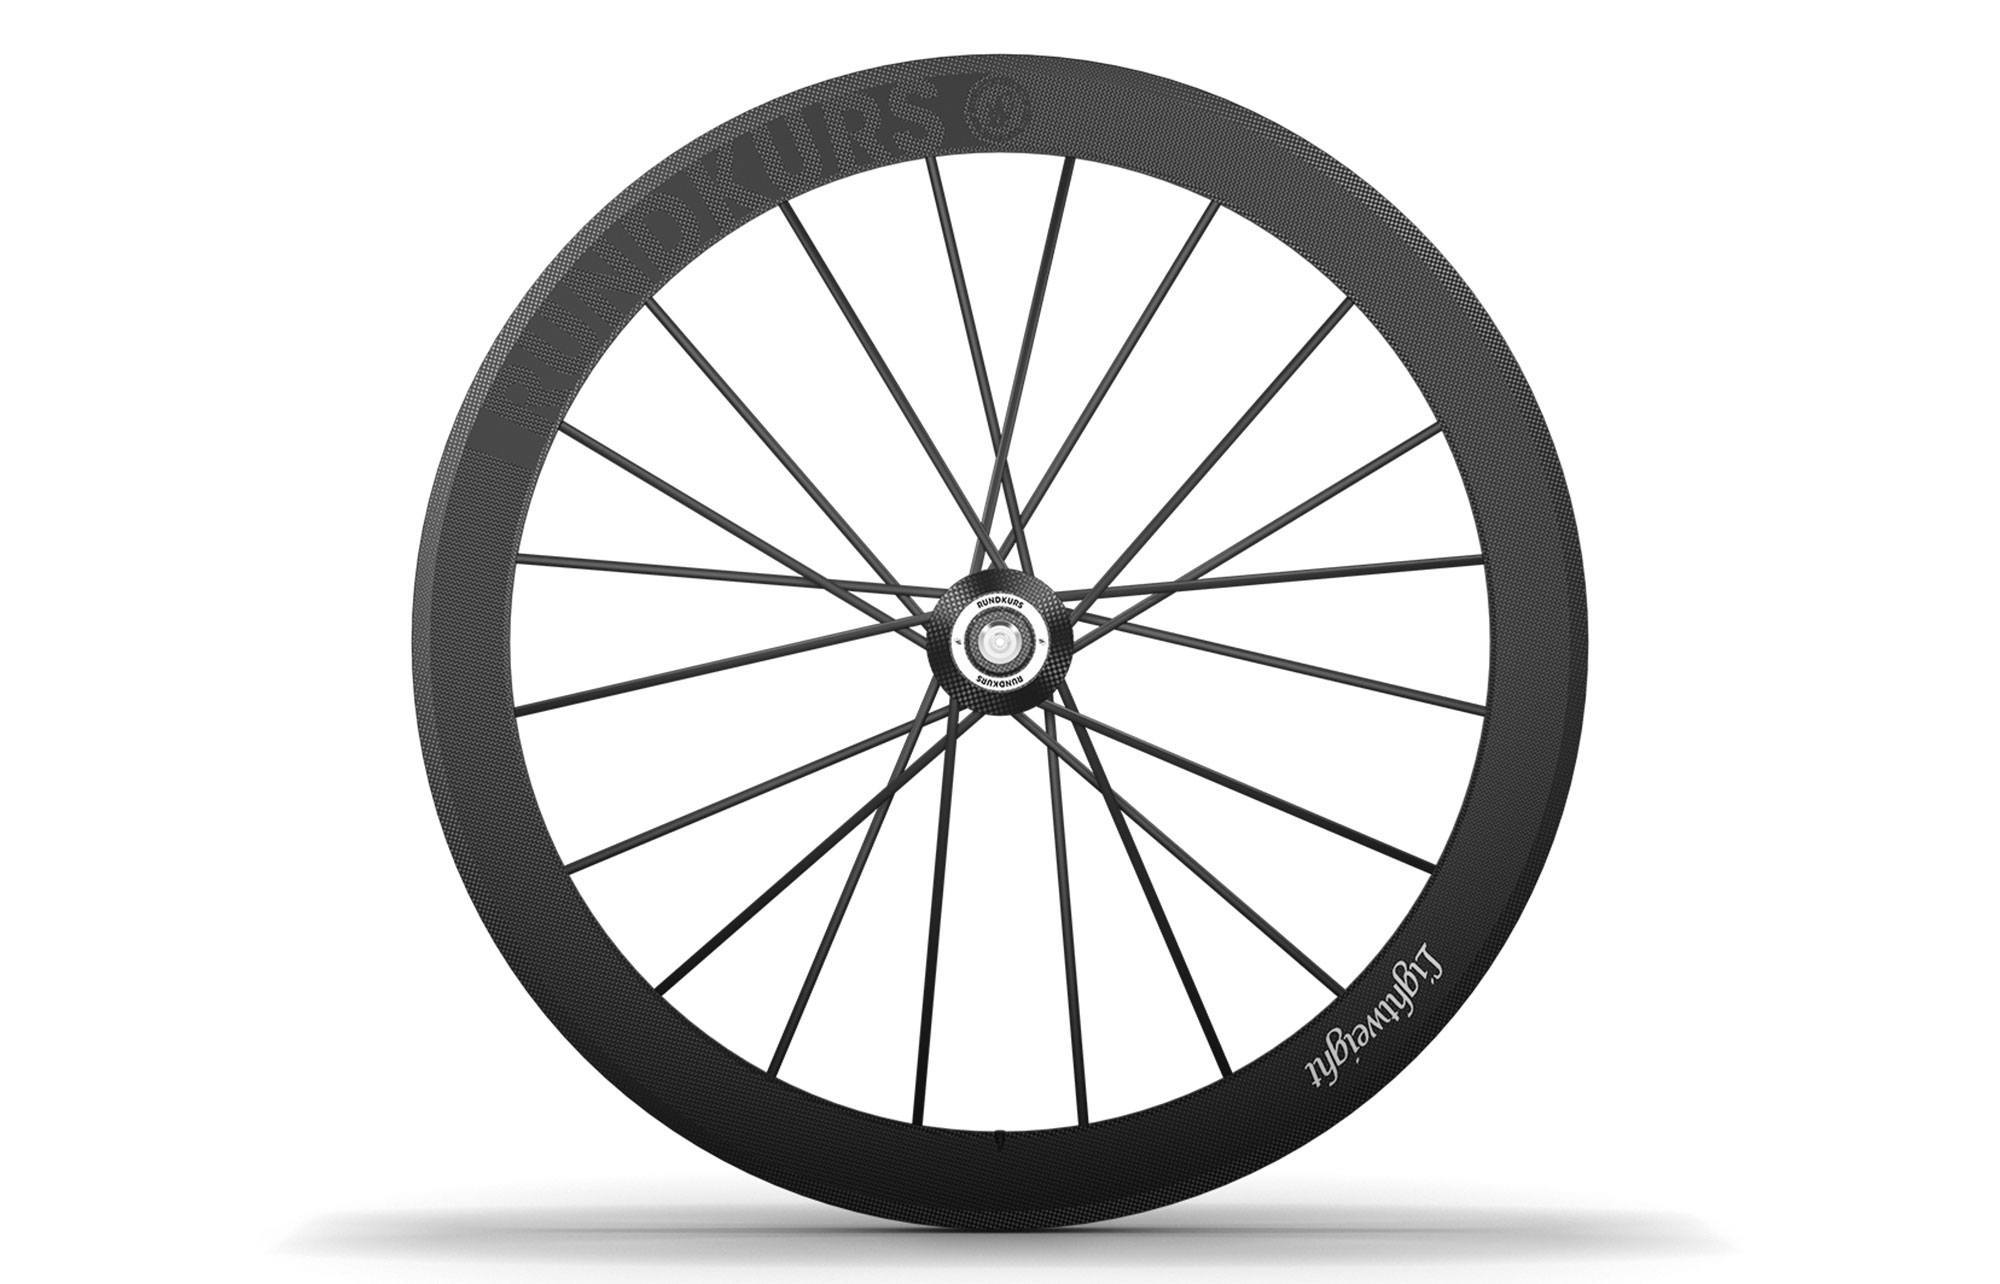 2016 Lightweight Rundkurs Tubular Rear Wheel  RA Cycles